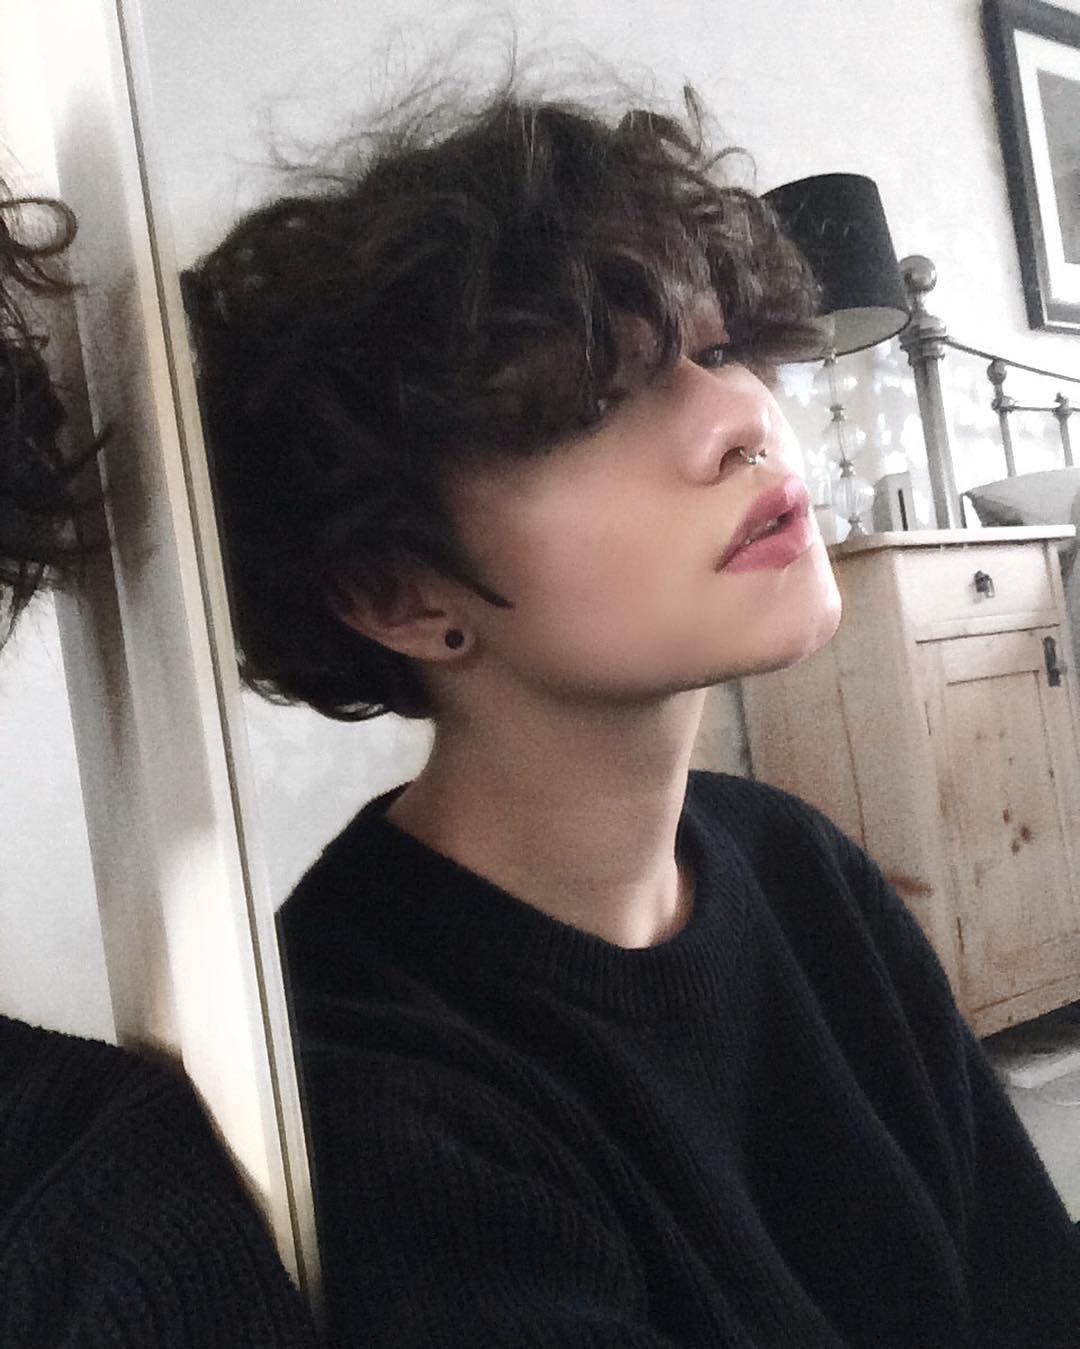 IG: @mimenoke | Jada-Min Park #tomboyhairstyles IG: @mimenoke | Jada-Min Park | Tomboy hairstyles, Short hair styles, Curly hair styles